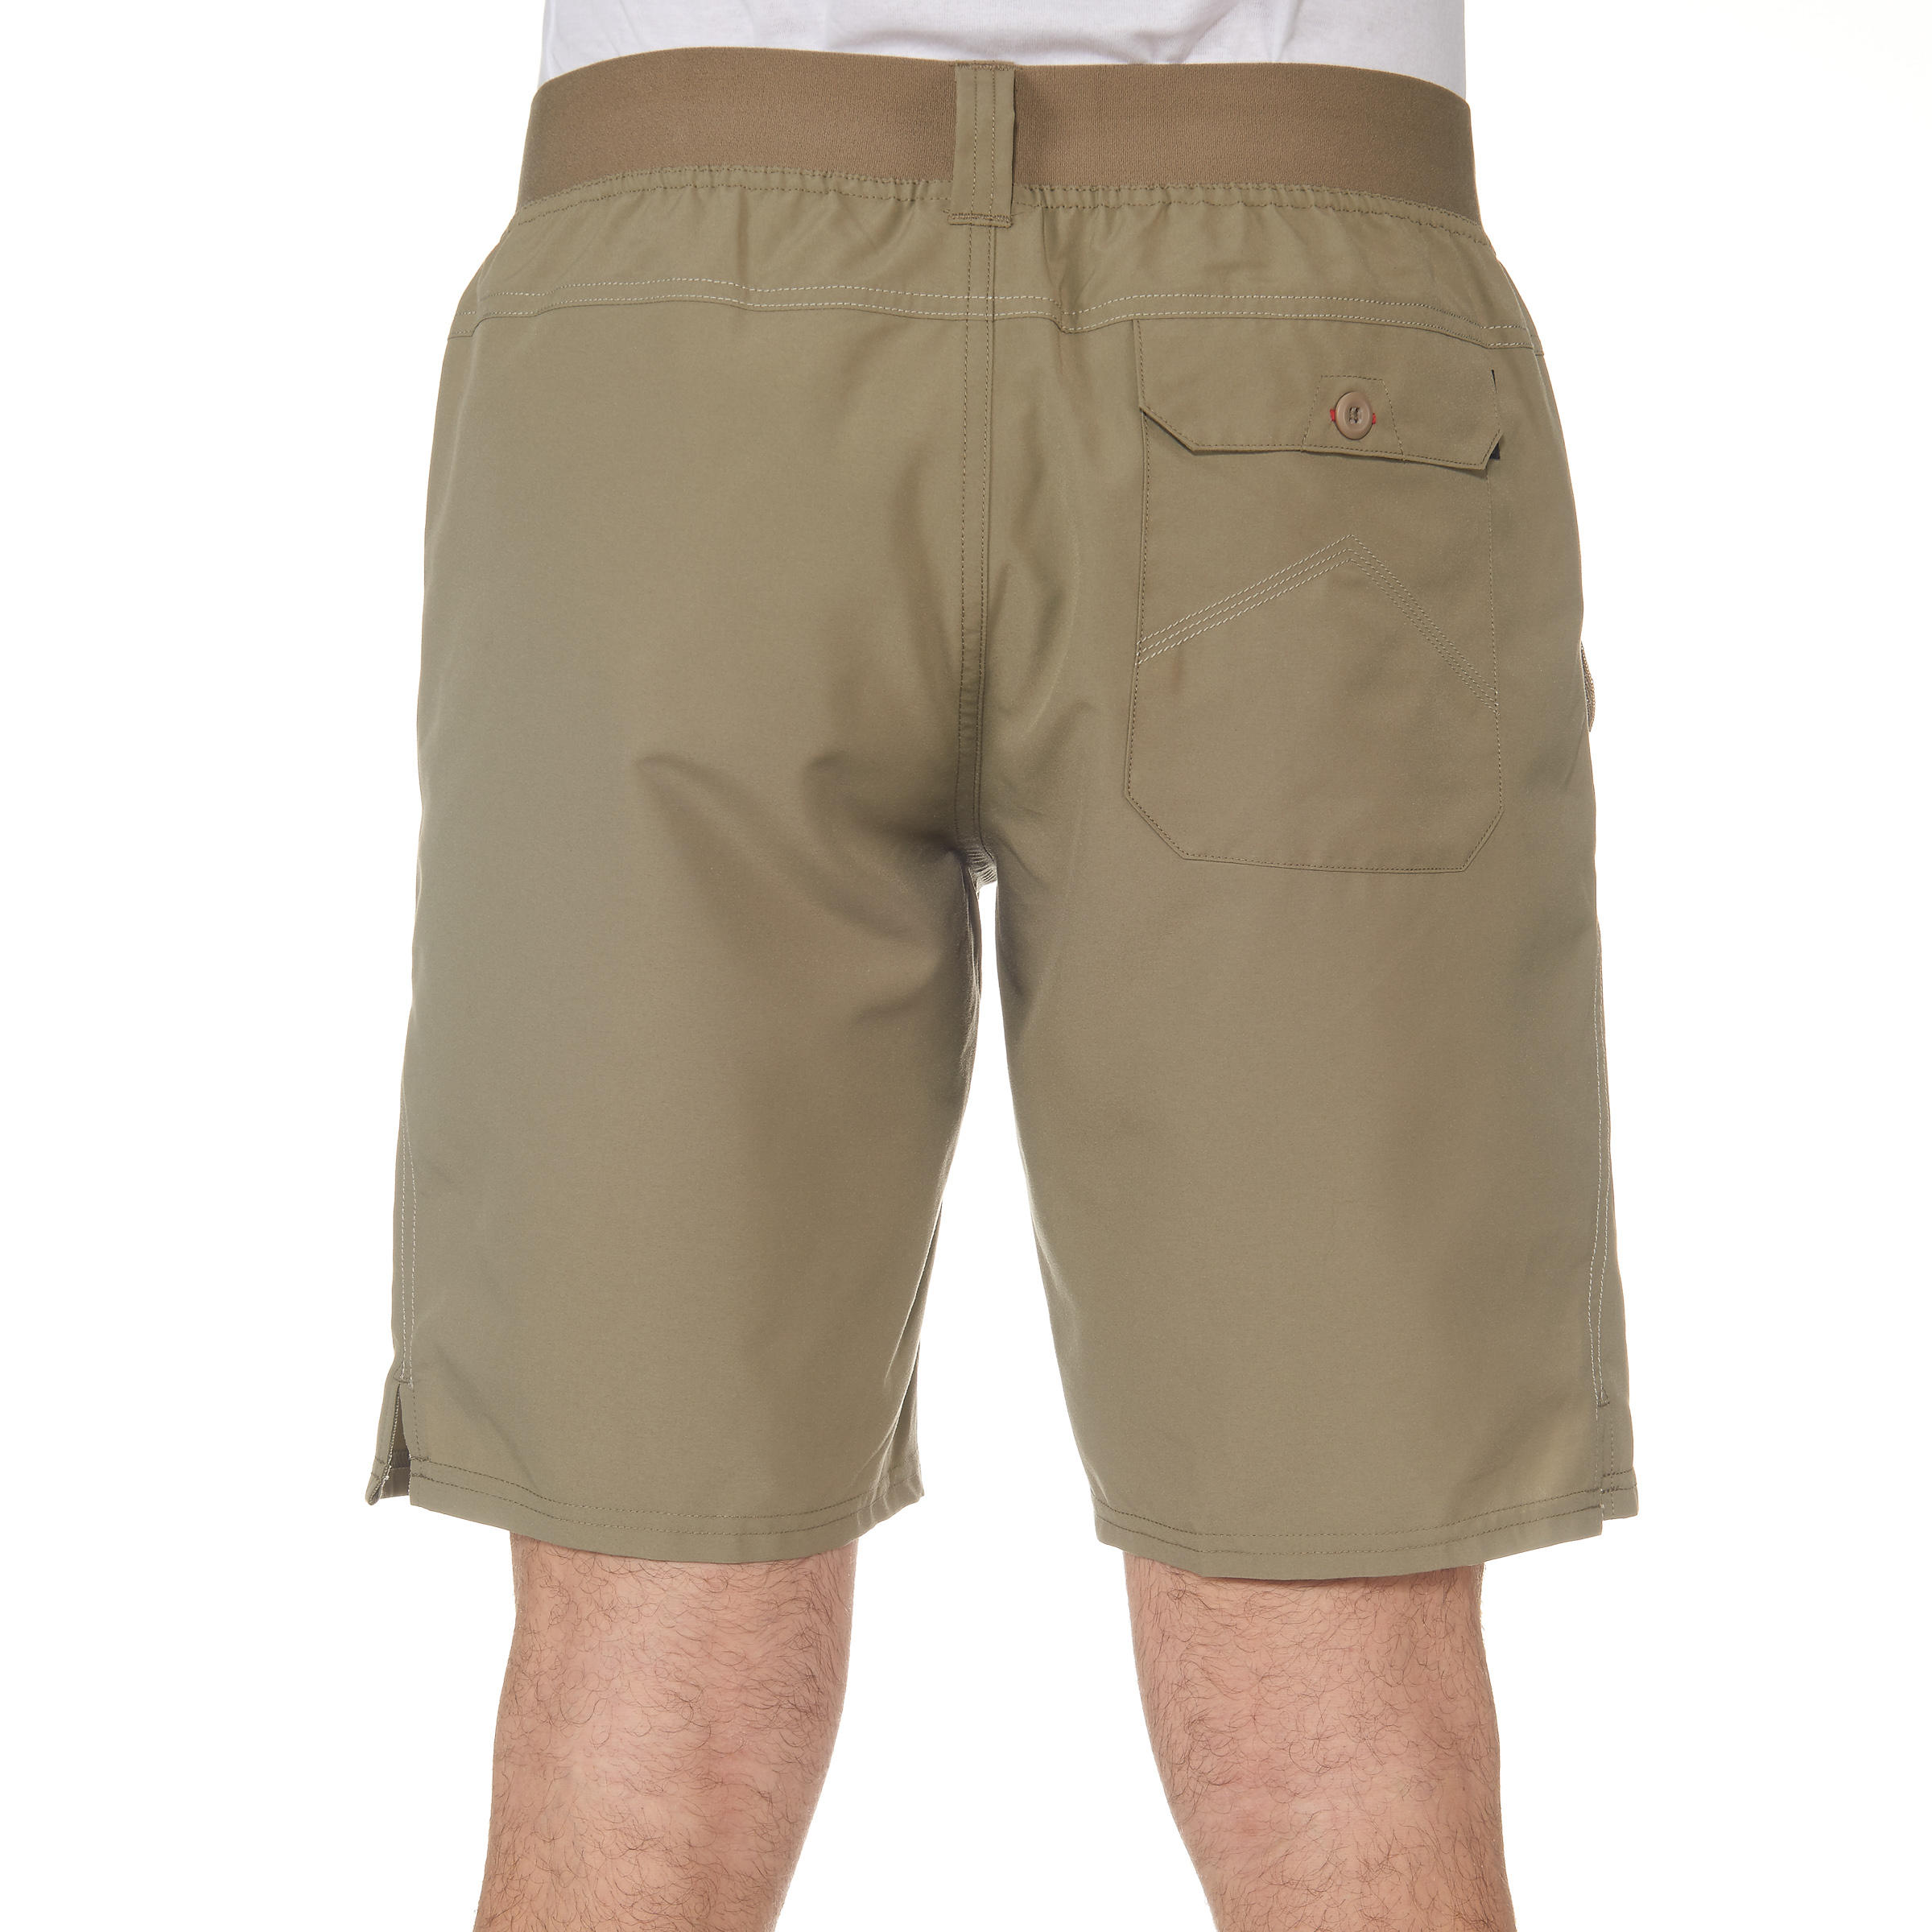 Men's Nature Hiking Shorts NH100 - Beige